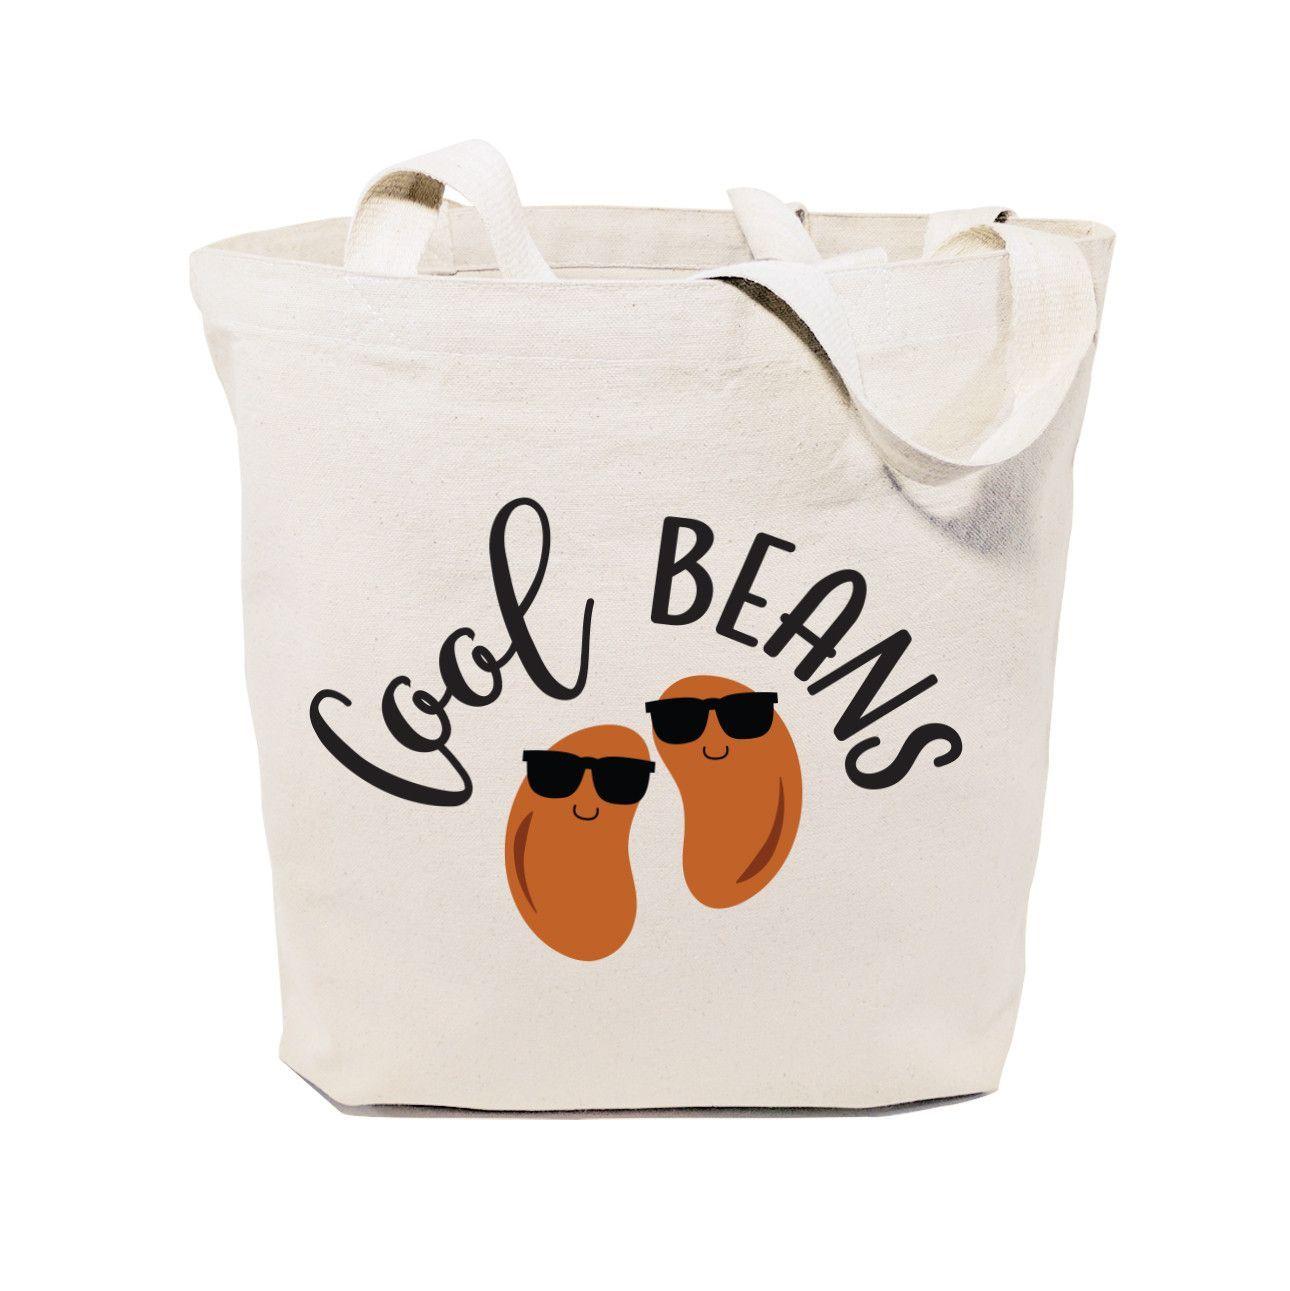 Cool Beans Cotton Canvas Tote Bag Anna Reusable